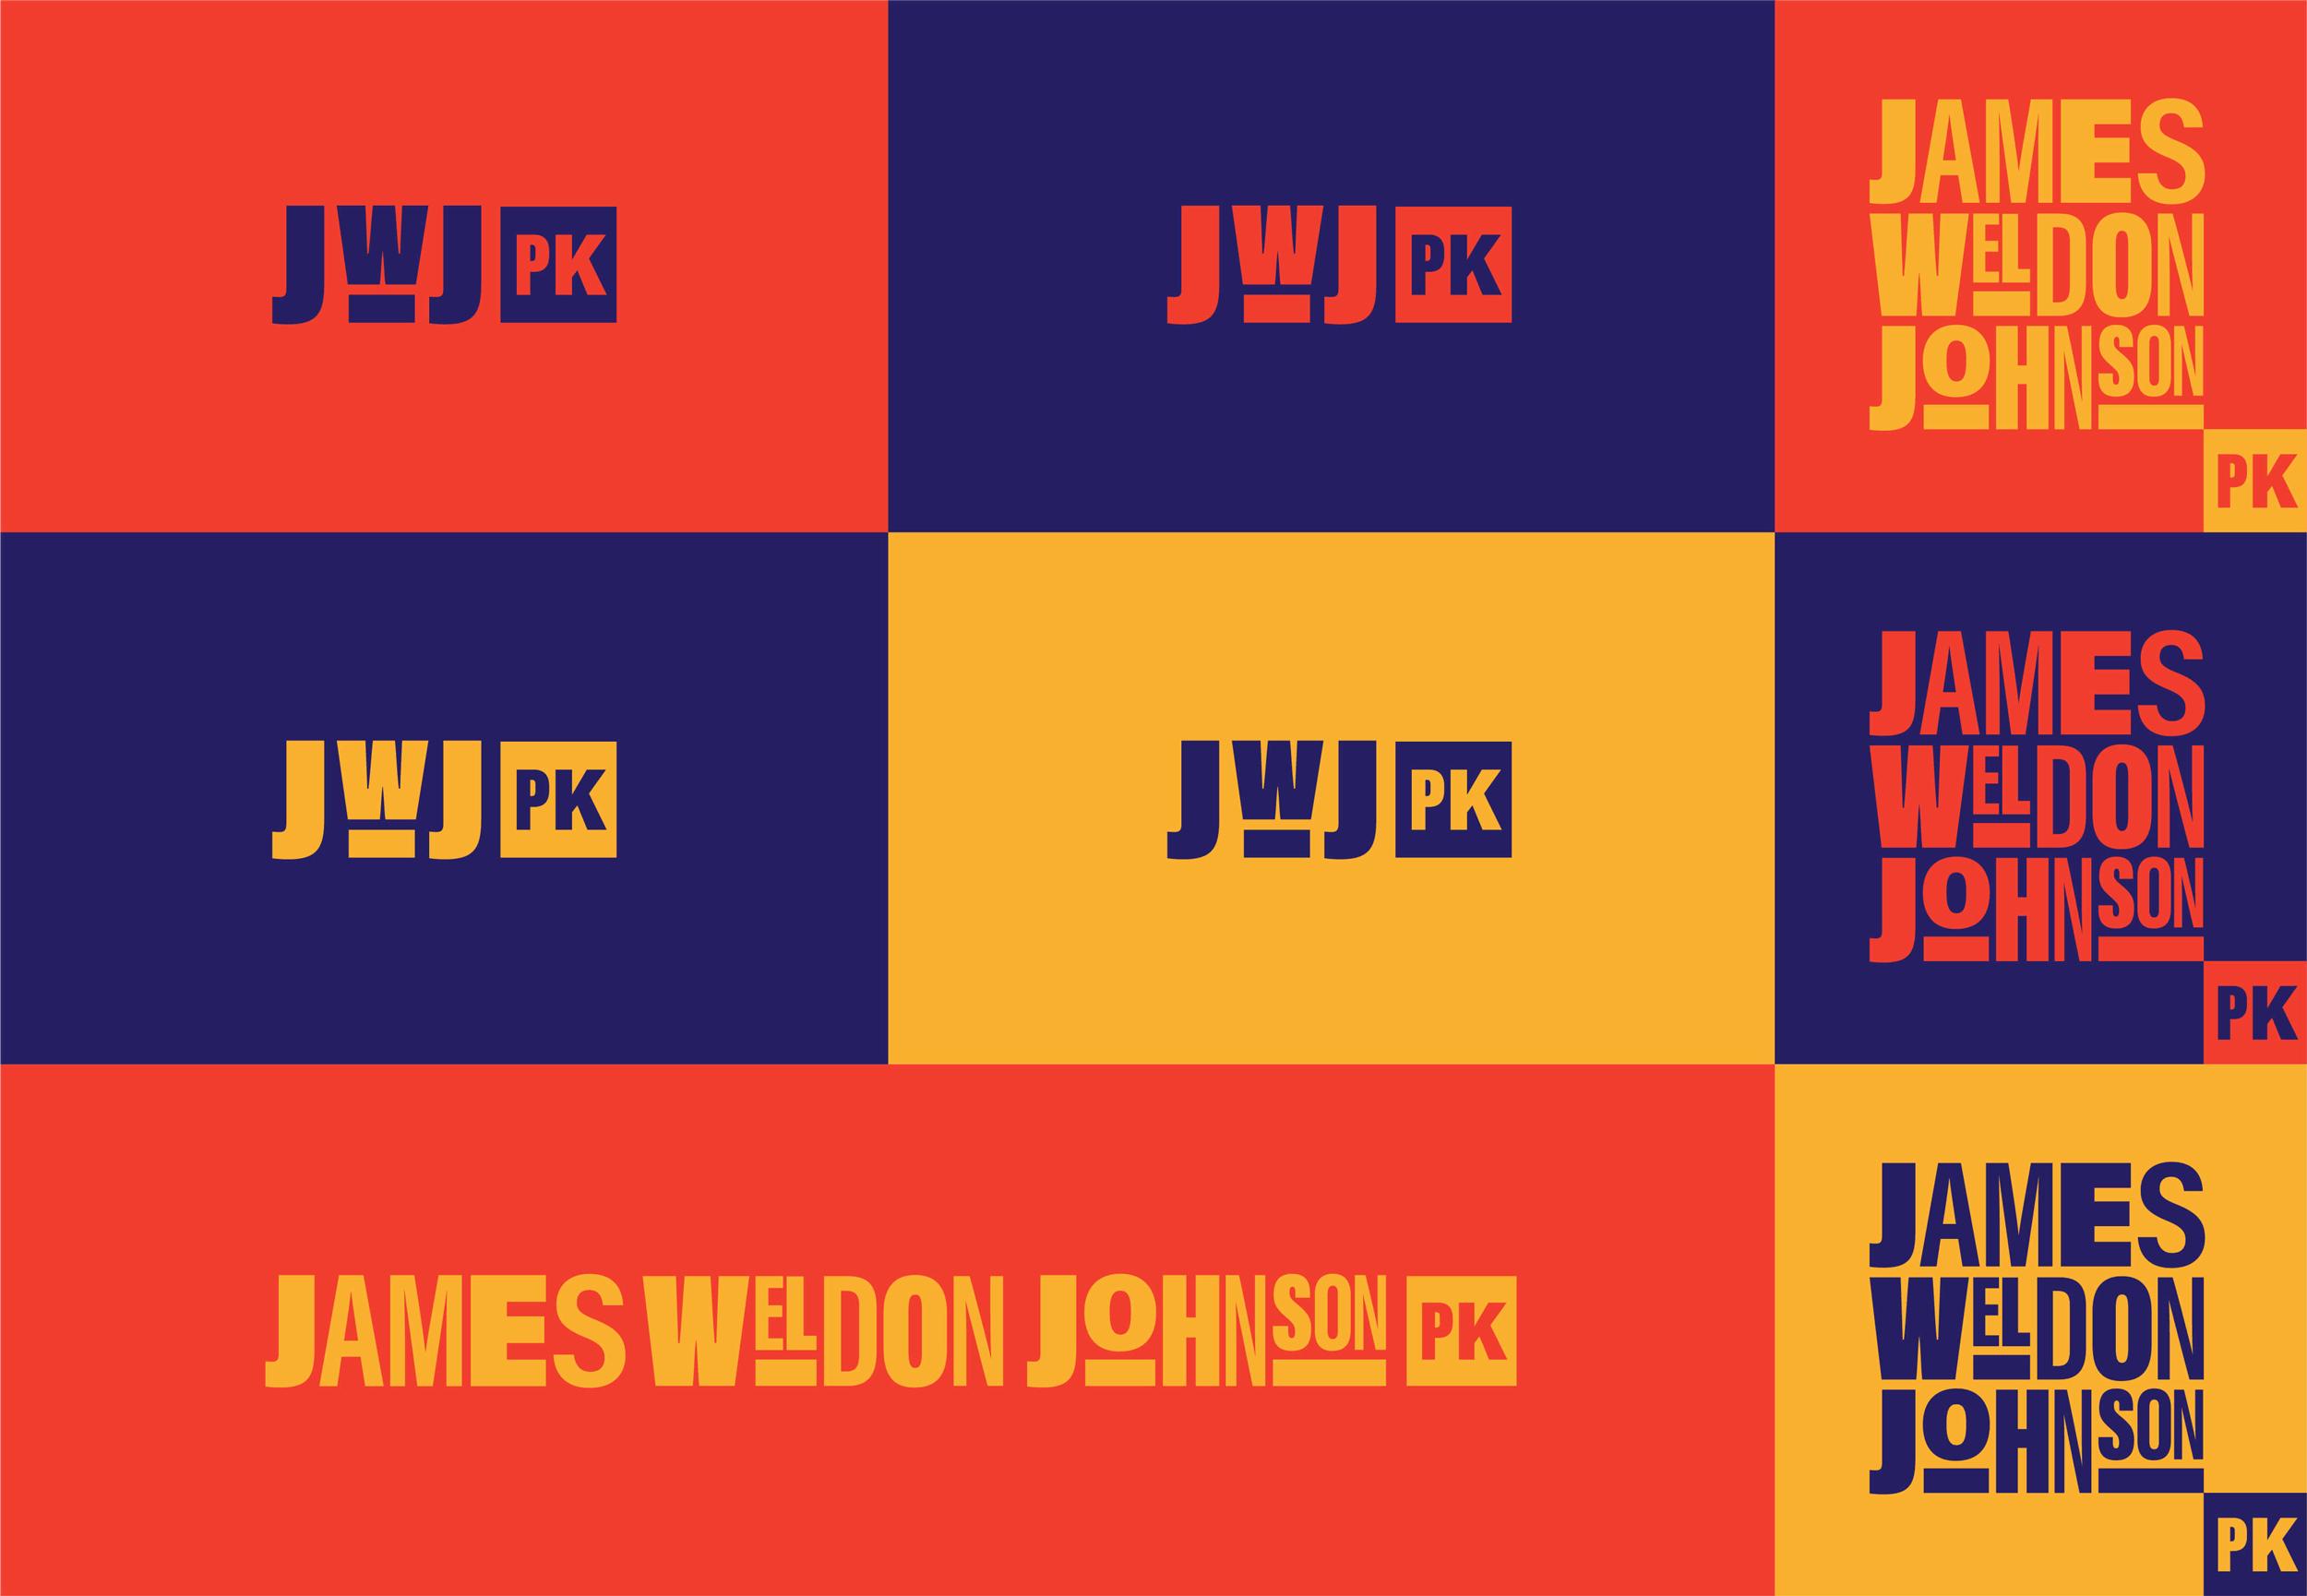 A collection of James Weldon Johnson Park logo treatments